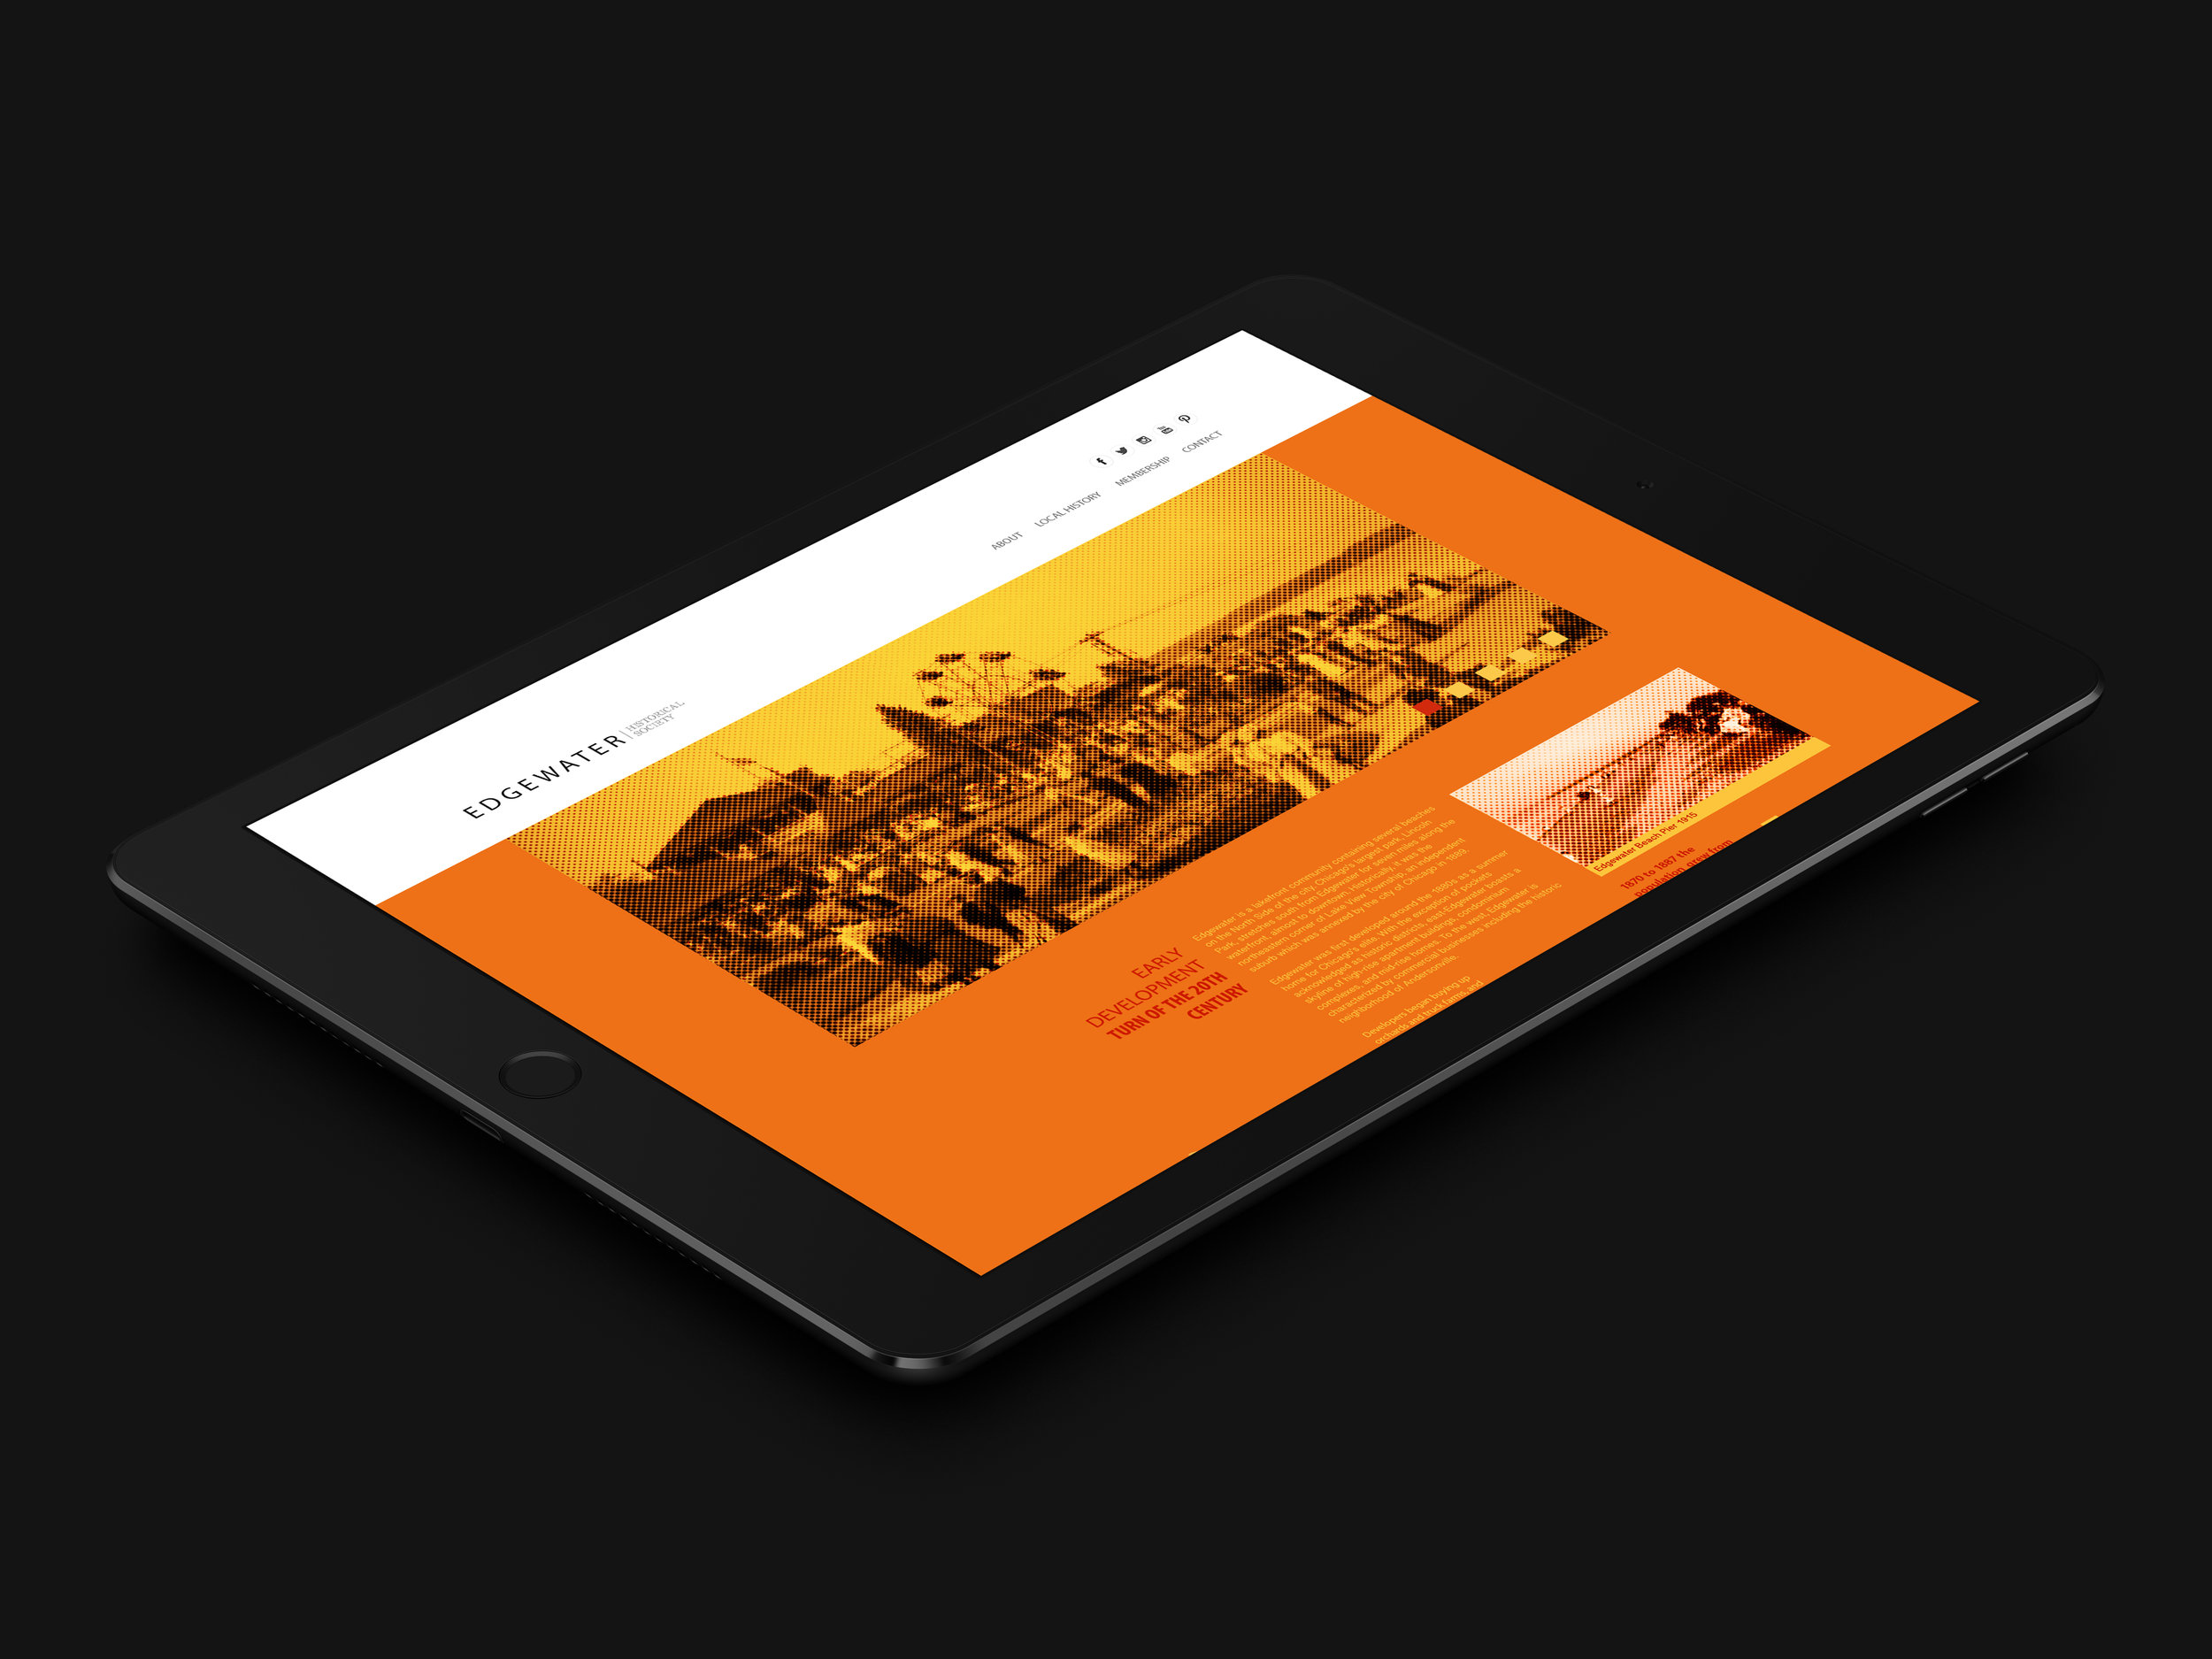 iPad-Mockup-edgewater.jpg